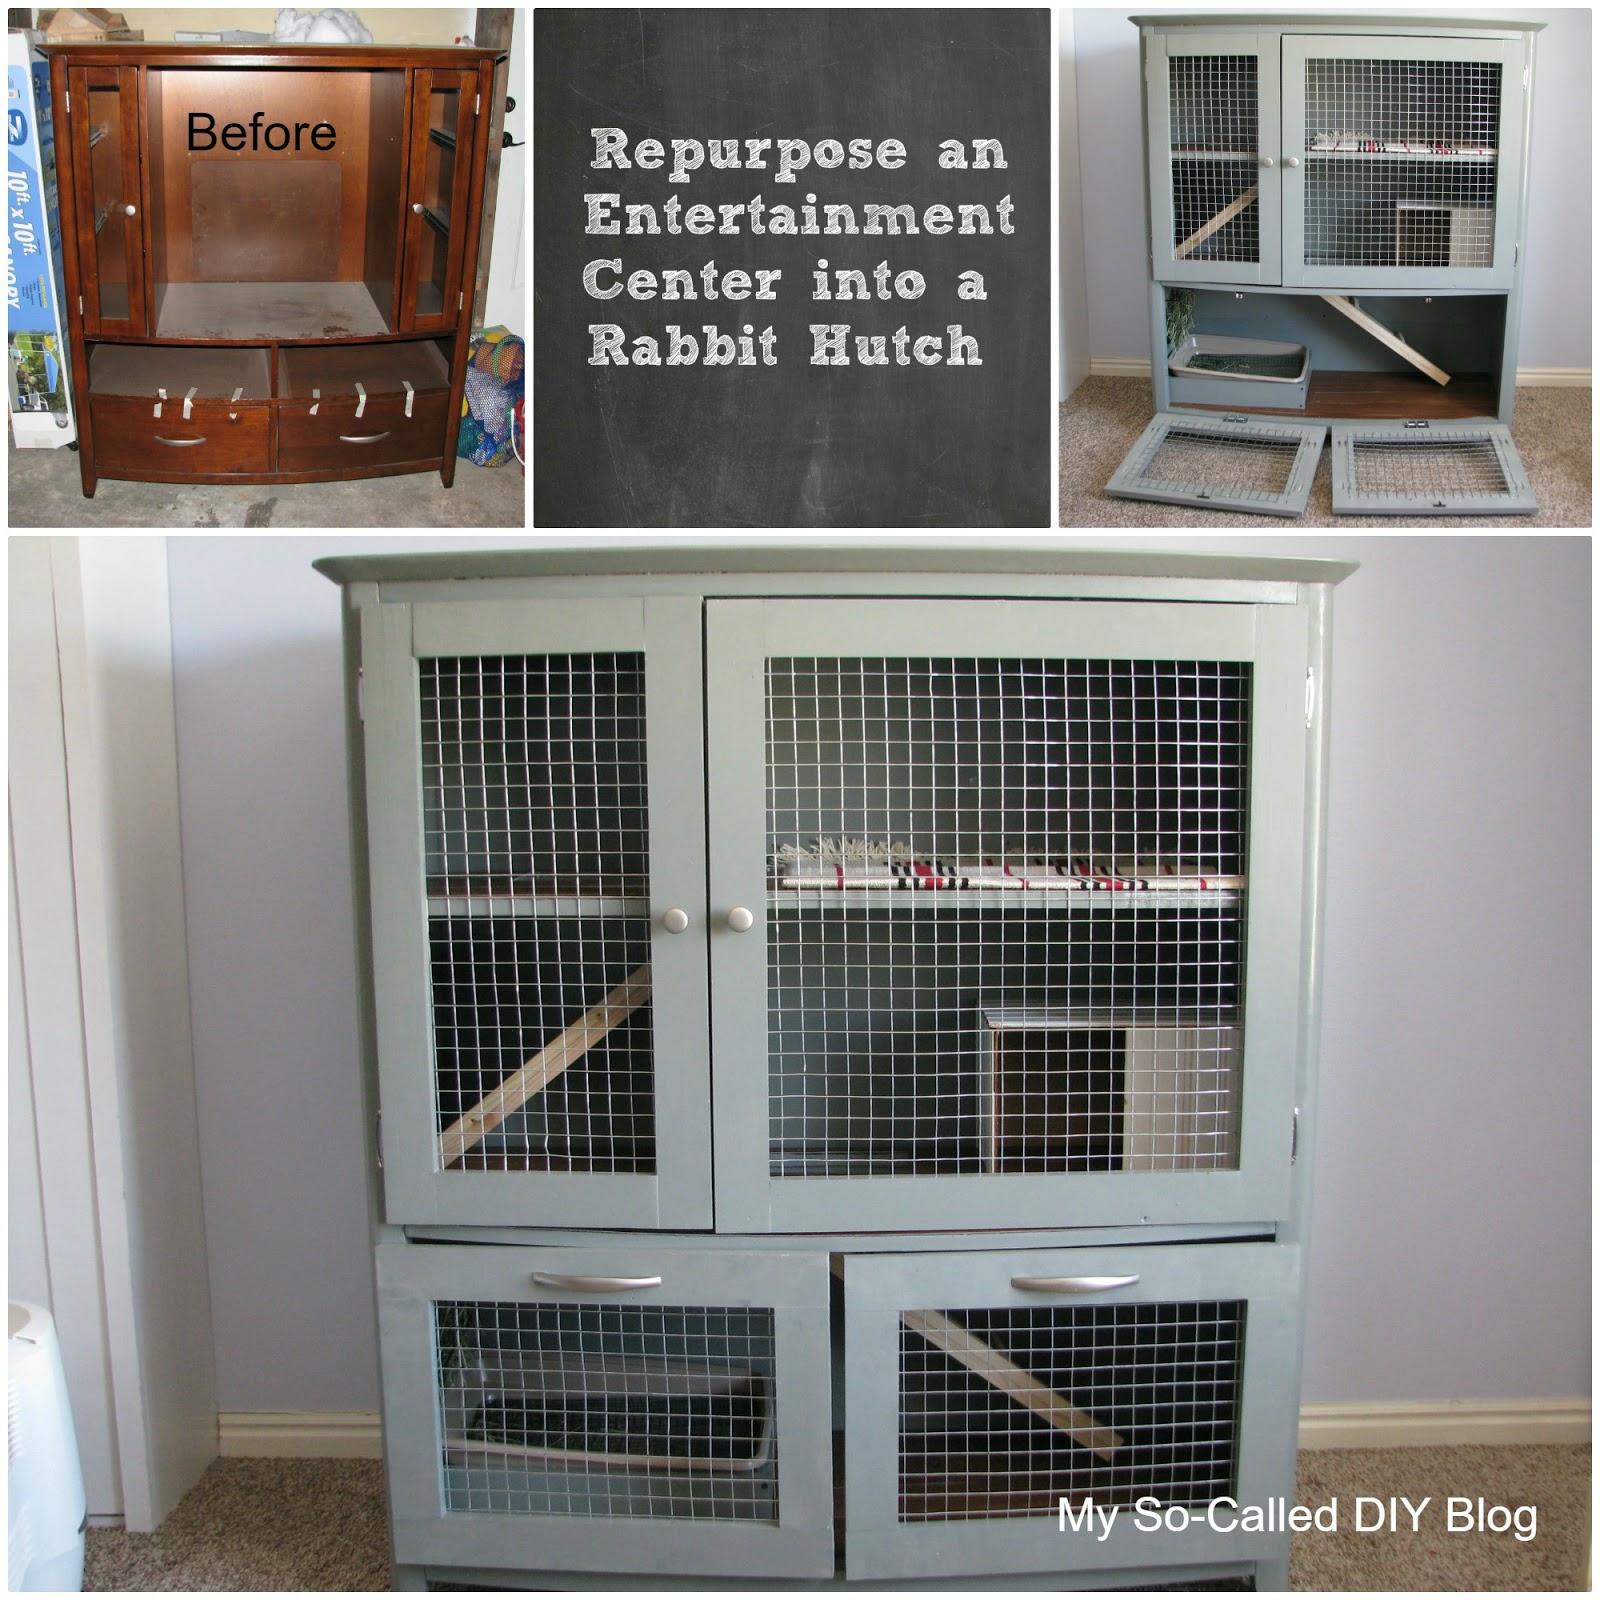 My So-Called DIY Blog: Entertainment Center Rabbit Hutch